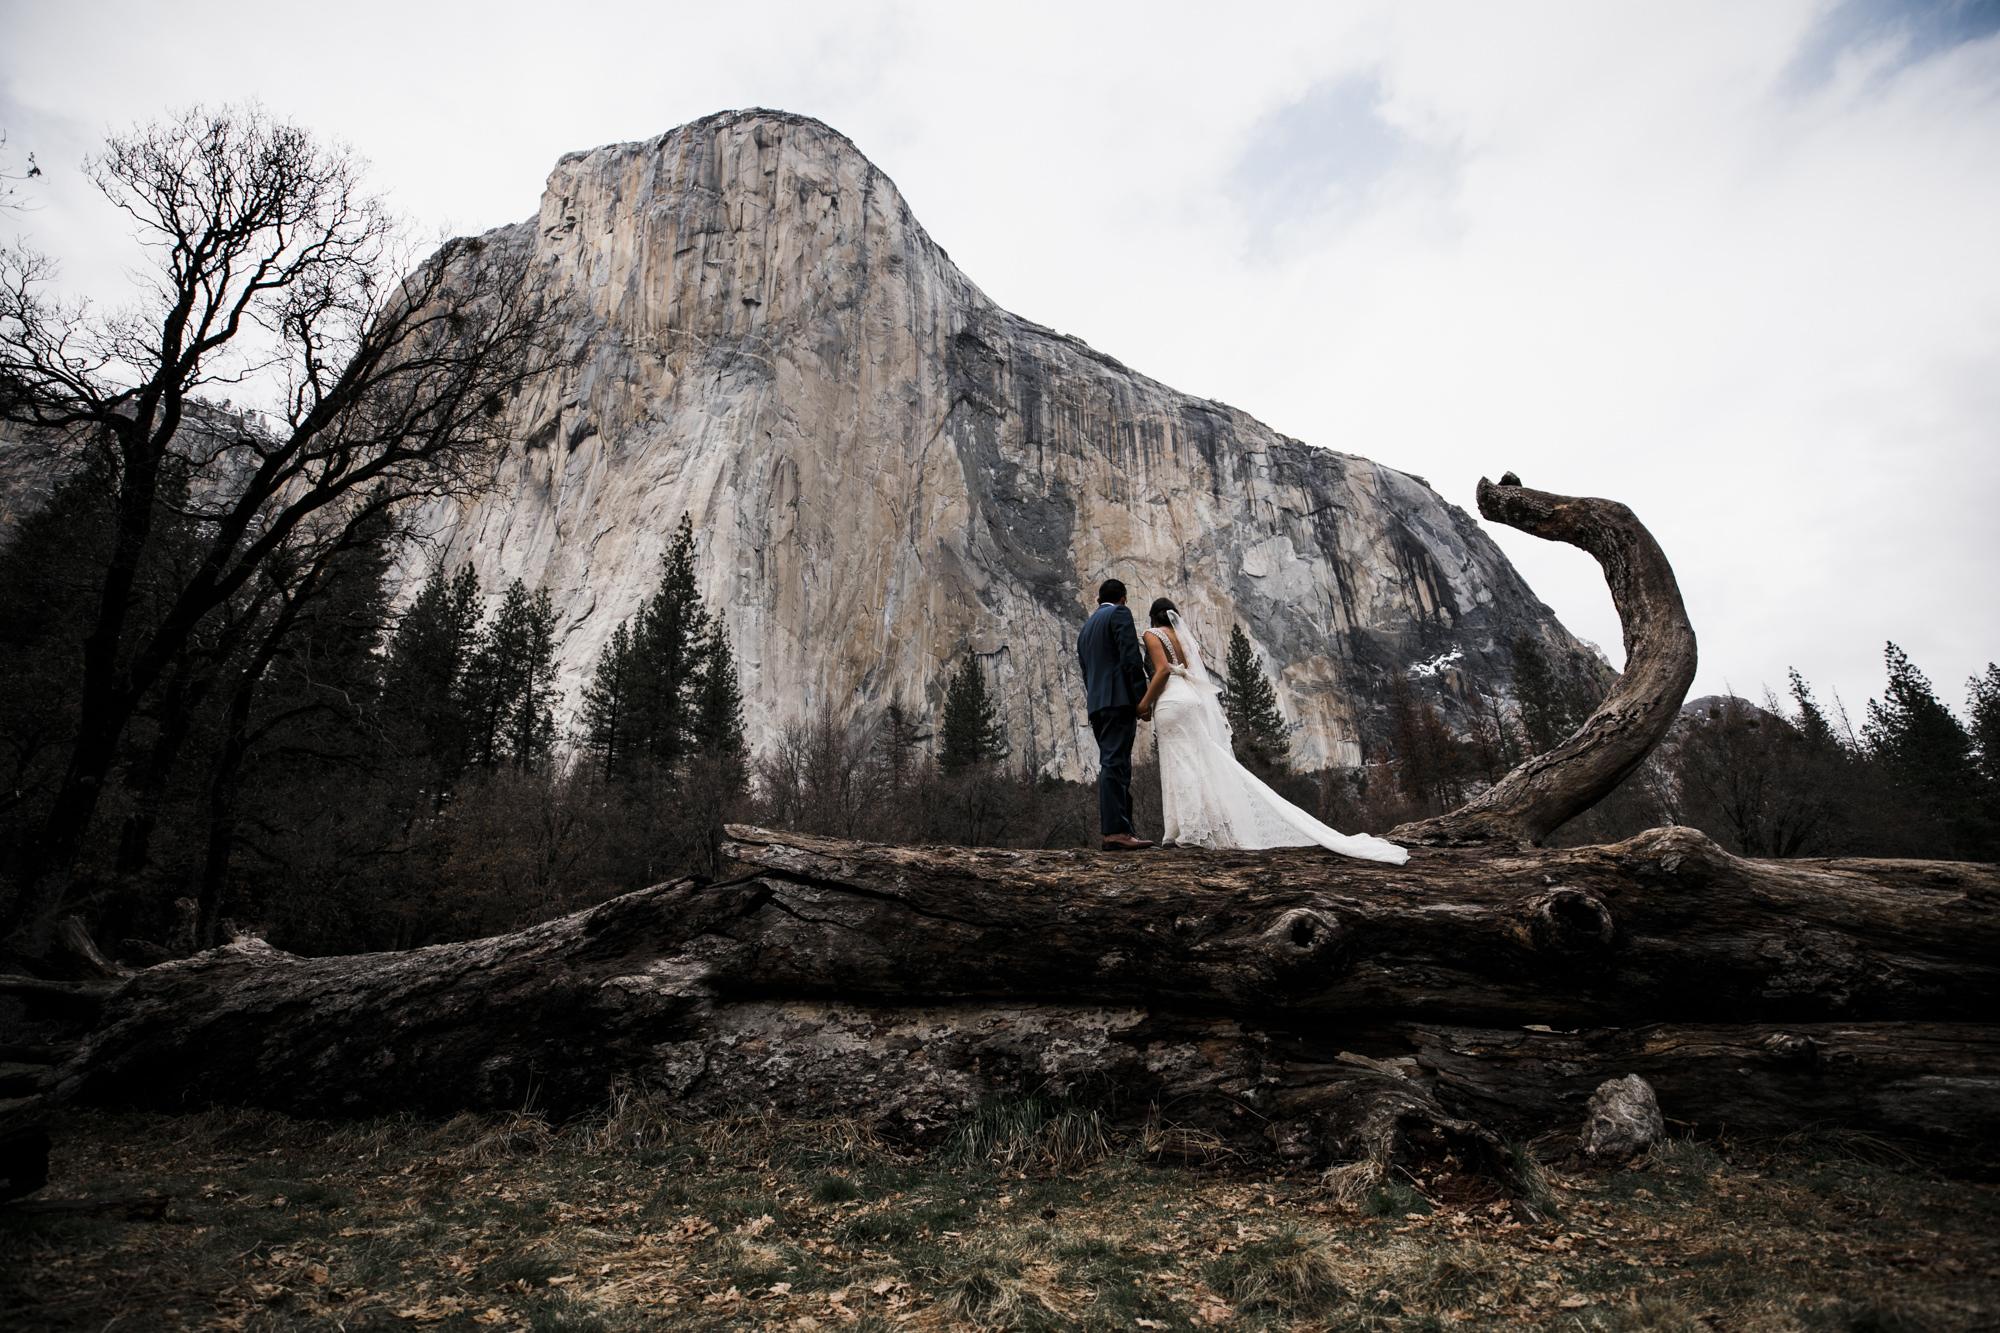 bride and groom in yosemite underneath el capitan on their wedding day